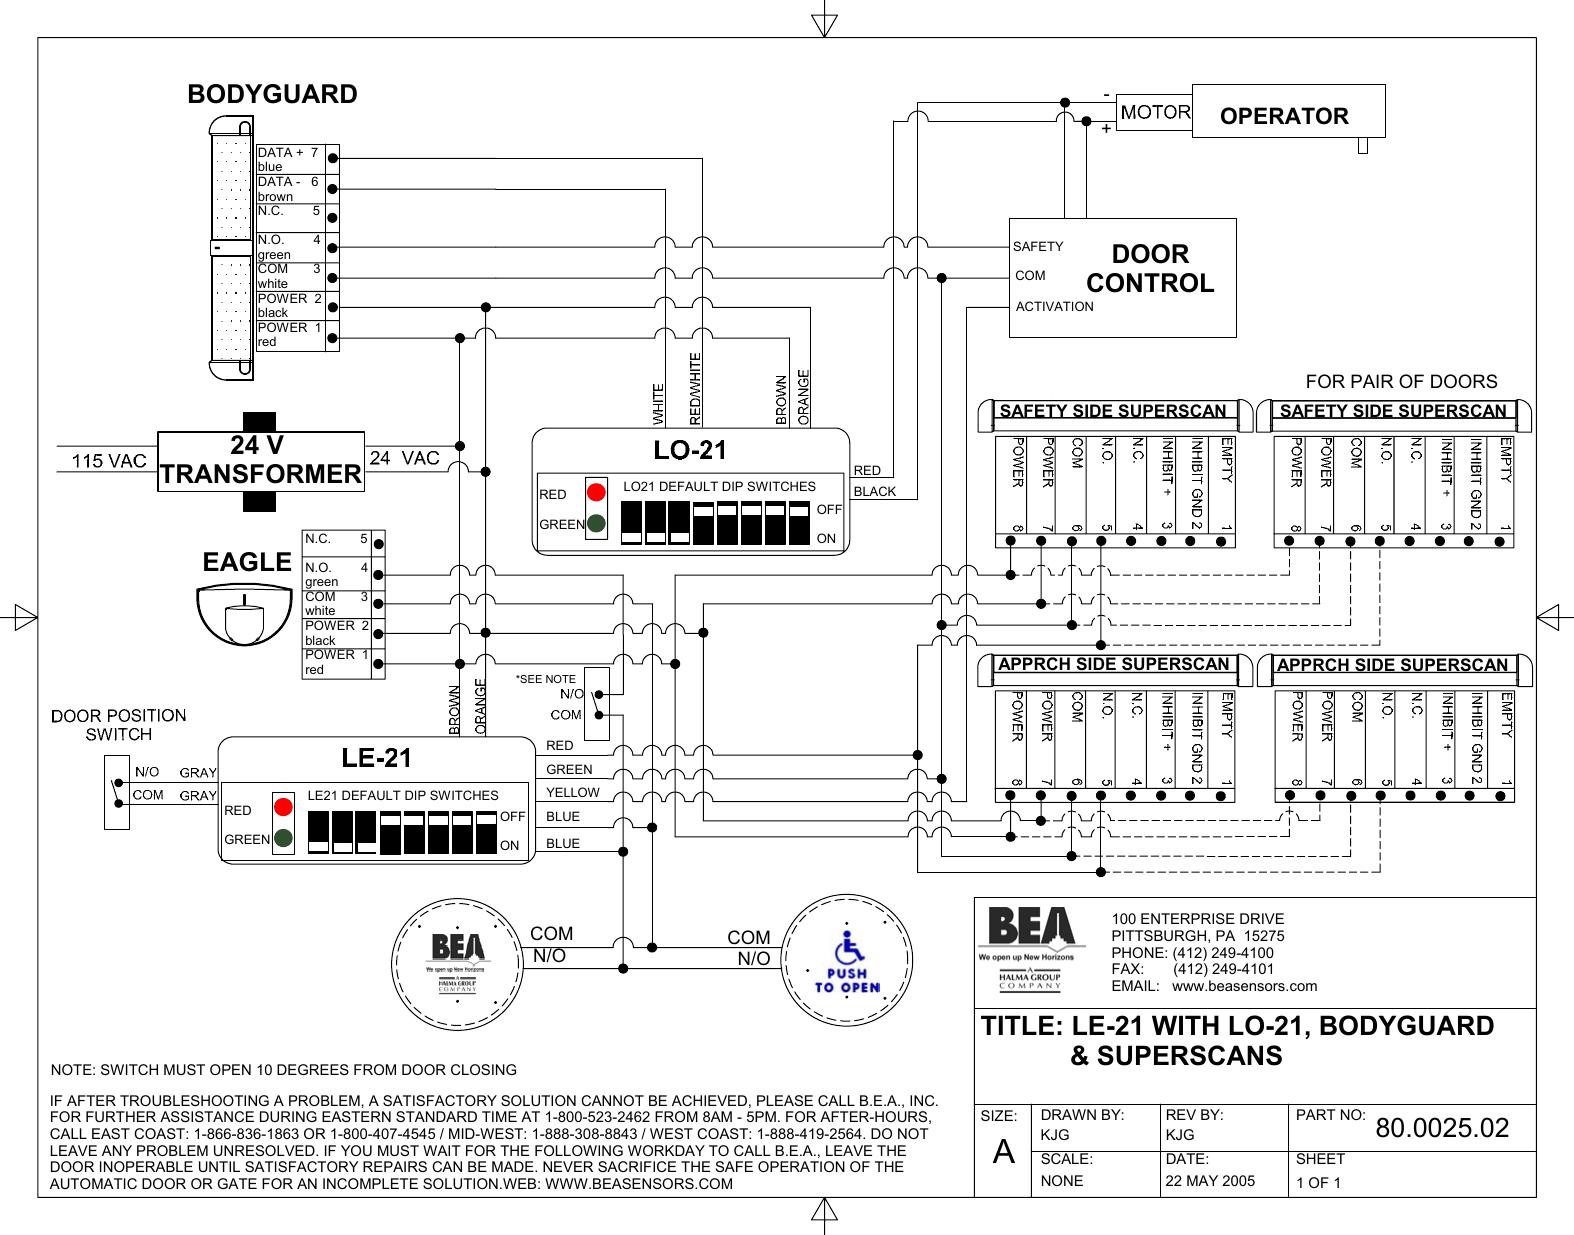 Bea Wiring Diagrams - How To Reset Wylex Fuse Box -  viiintage.yenpancane.jeanjaures37.fr | Bea Wiring Diagrams |  | Wiring Diagram Resource